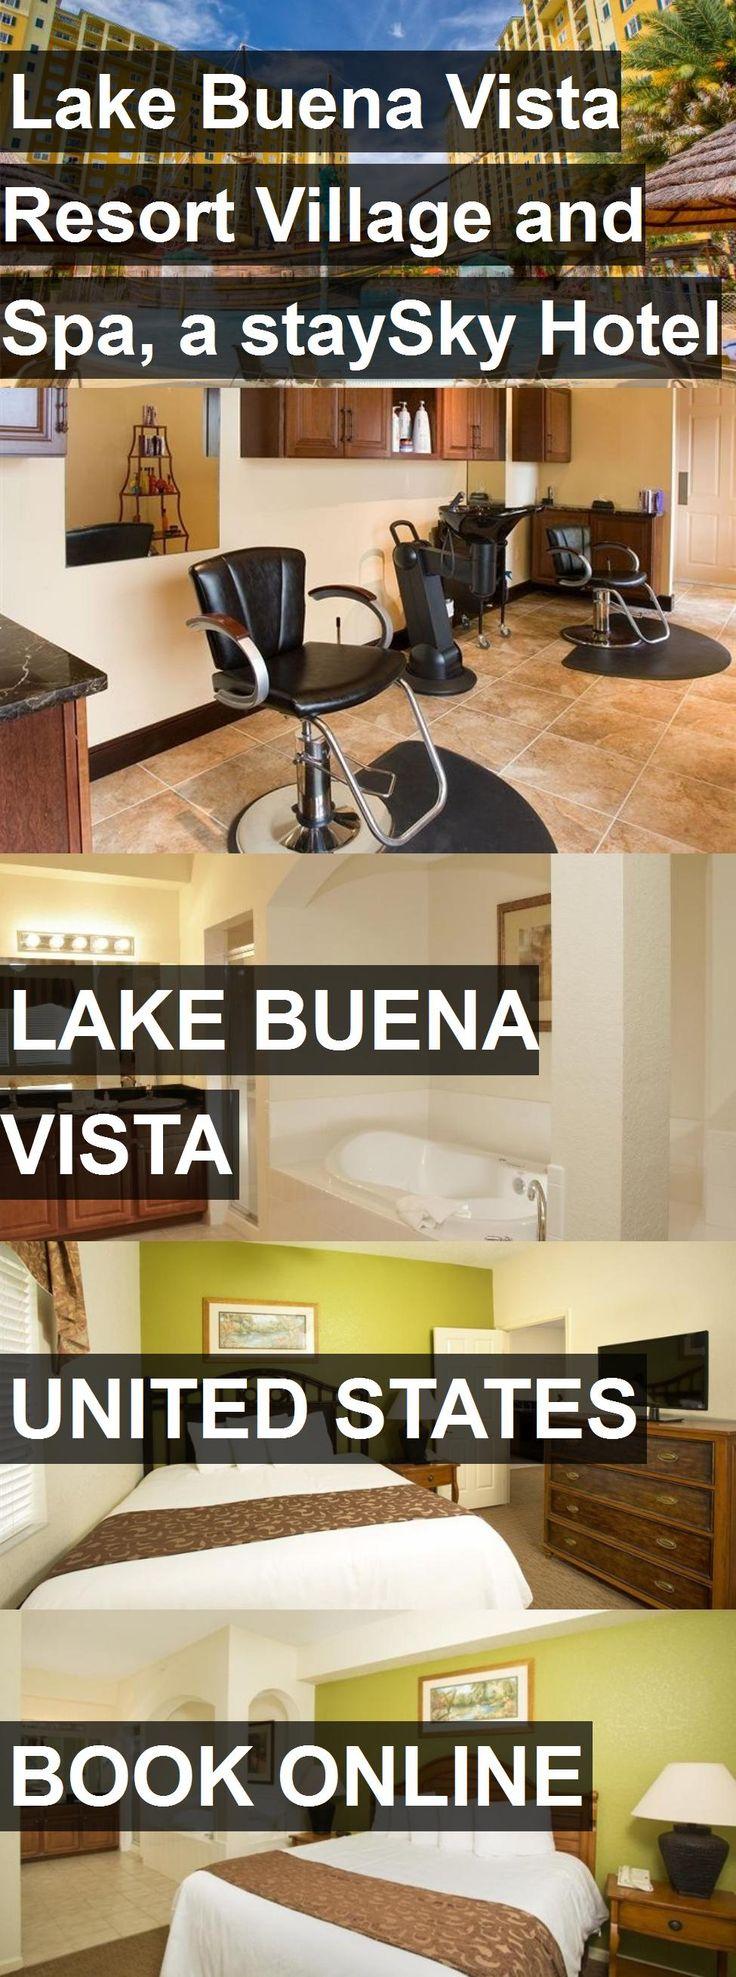 Lake Buena Vista Resort Village and Spa, a staySky Hotel